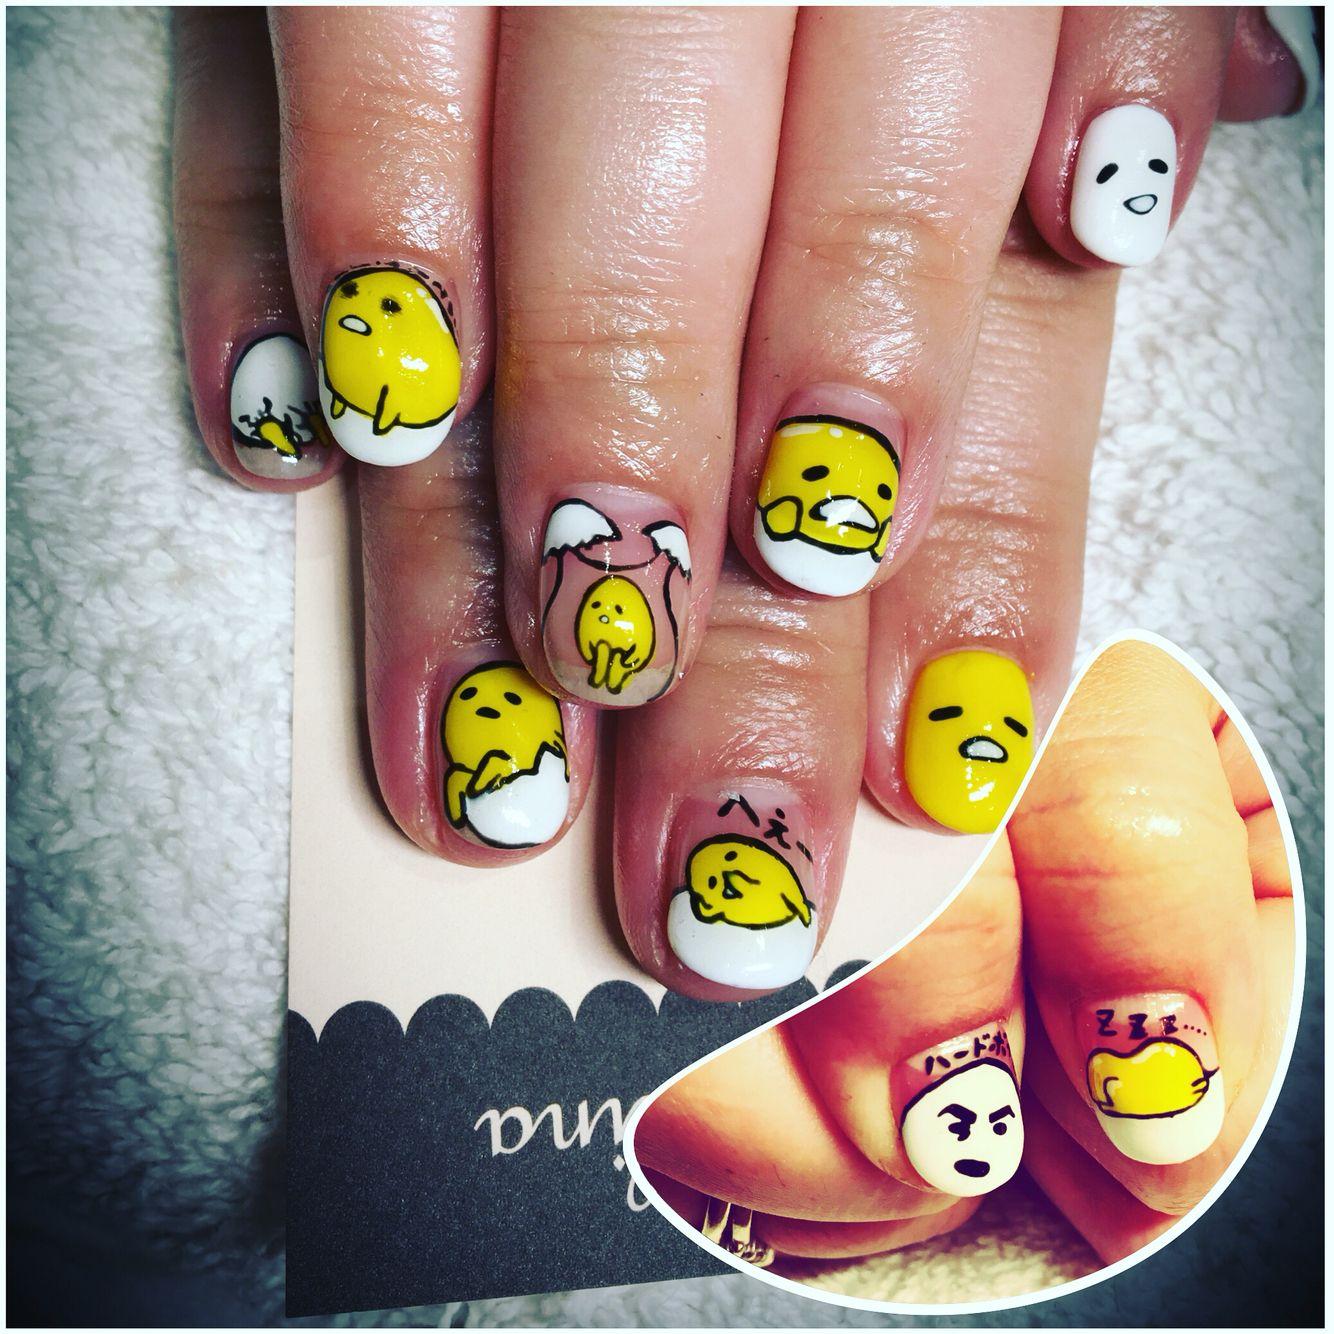 Gudetama nails by marcelina nails in old Torrance | ногти ...